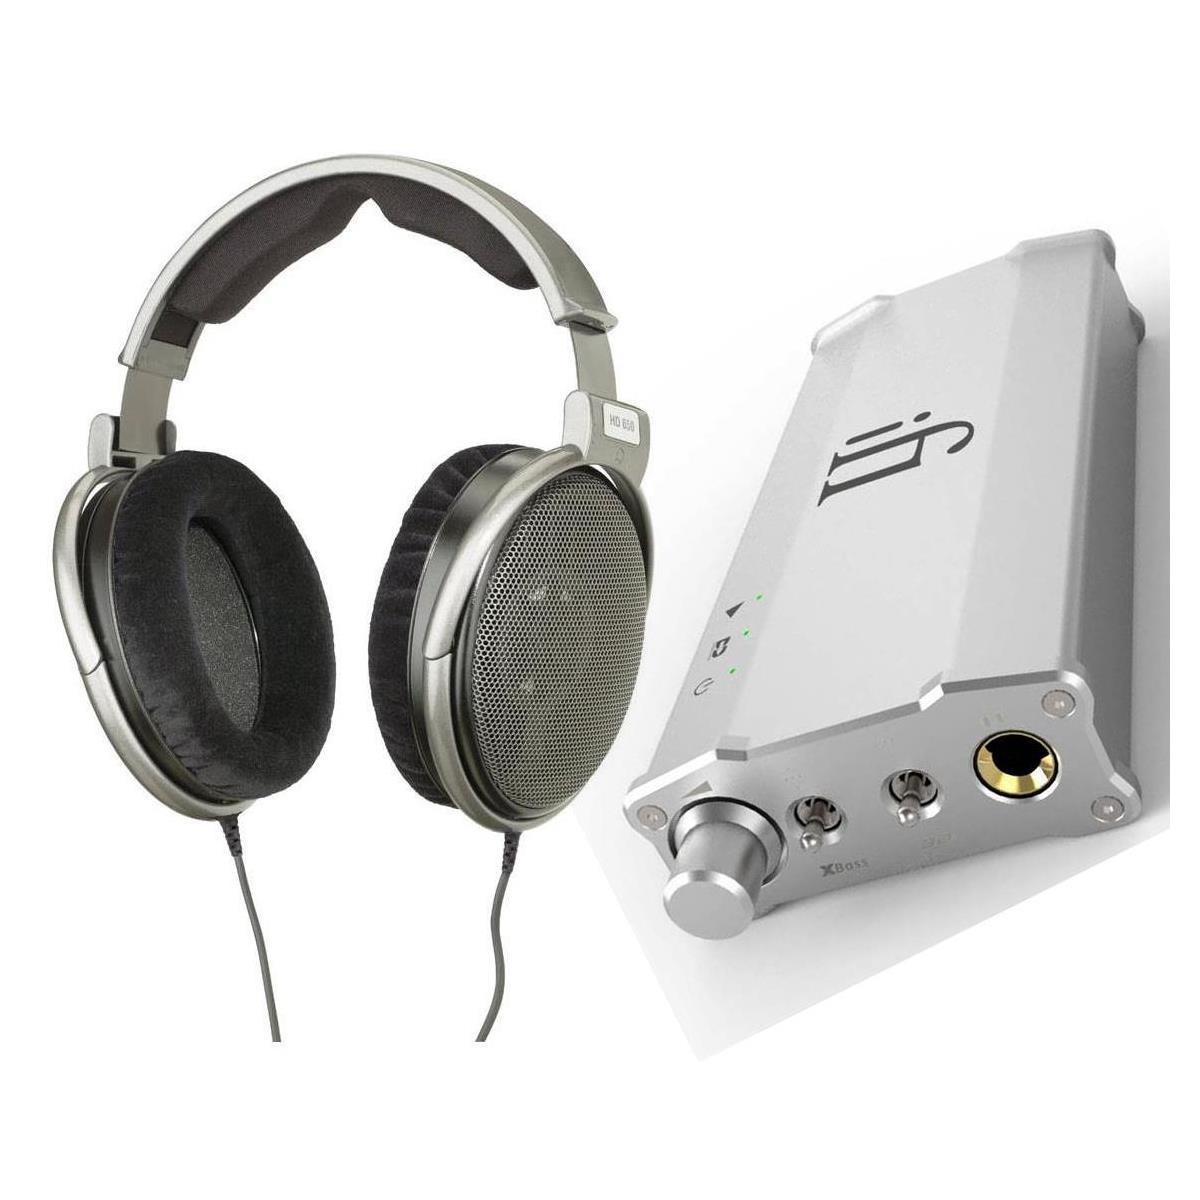 Sennheiser HD650 Headphone w/ iFi Micro iCAN Special Edition Headphone Amp $549 + free shipping